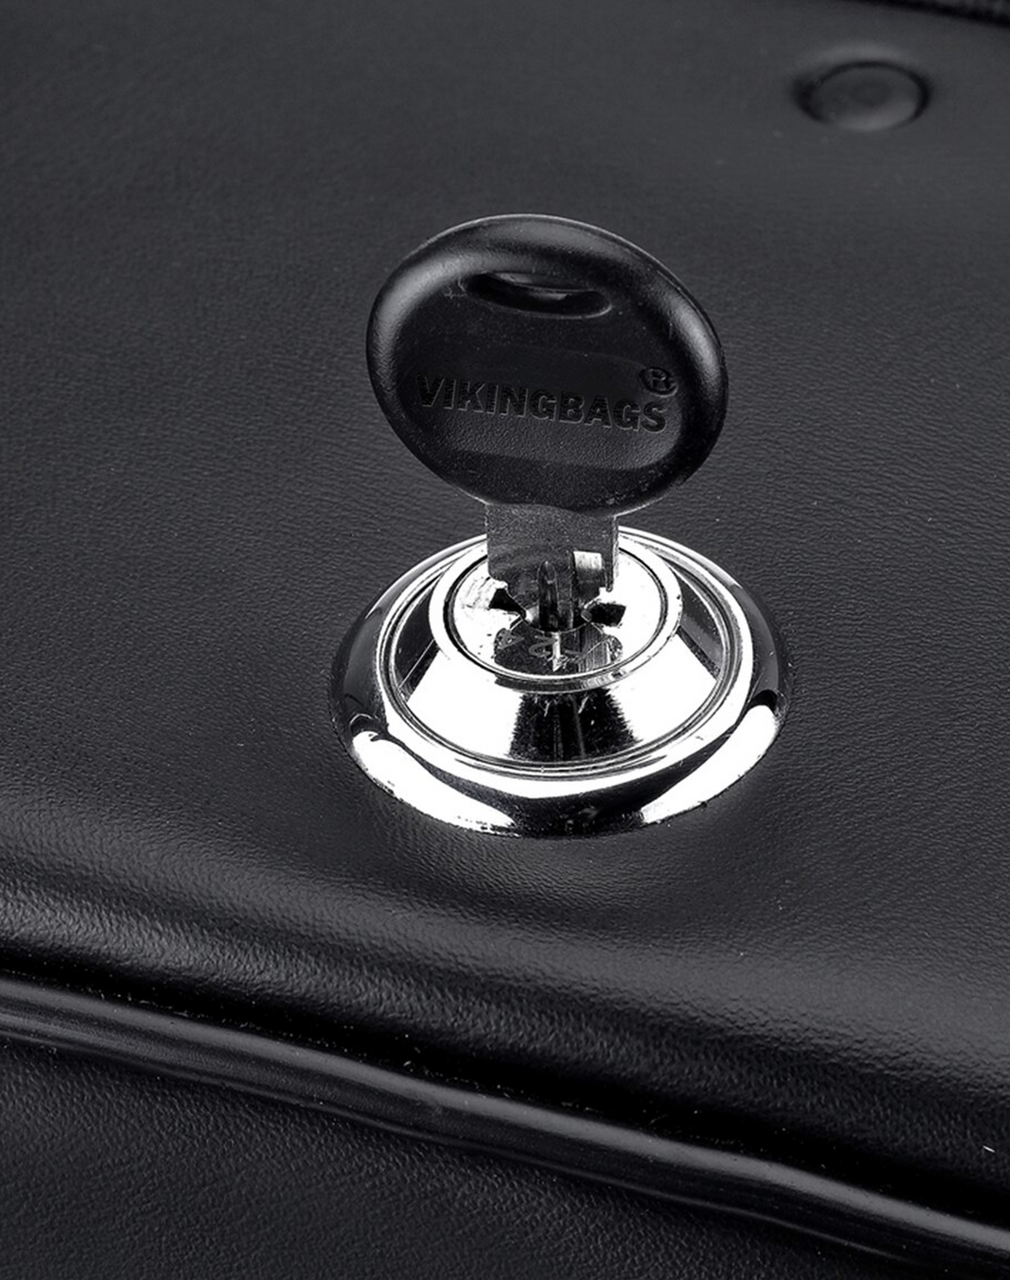 Indian Chief Standard Charger Single Strap Medium Motorcycle Saddlebags Key Lock View